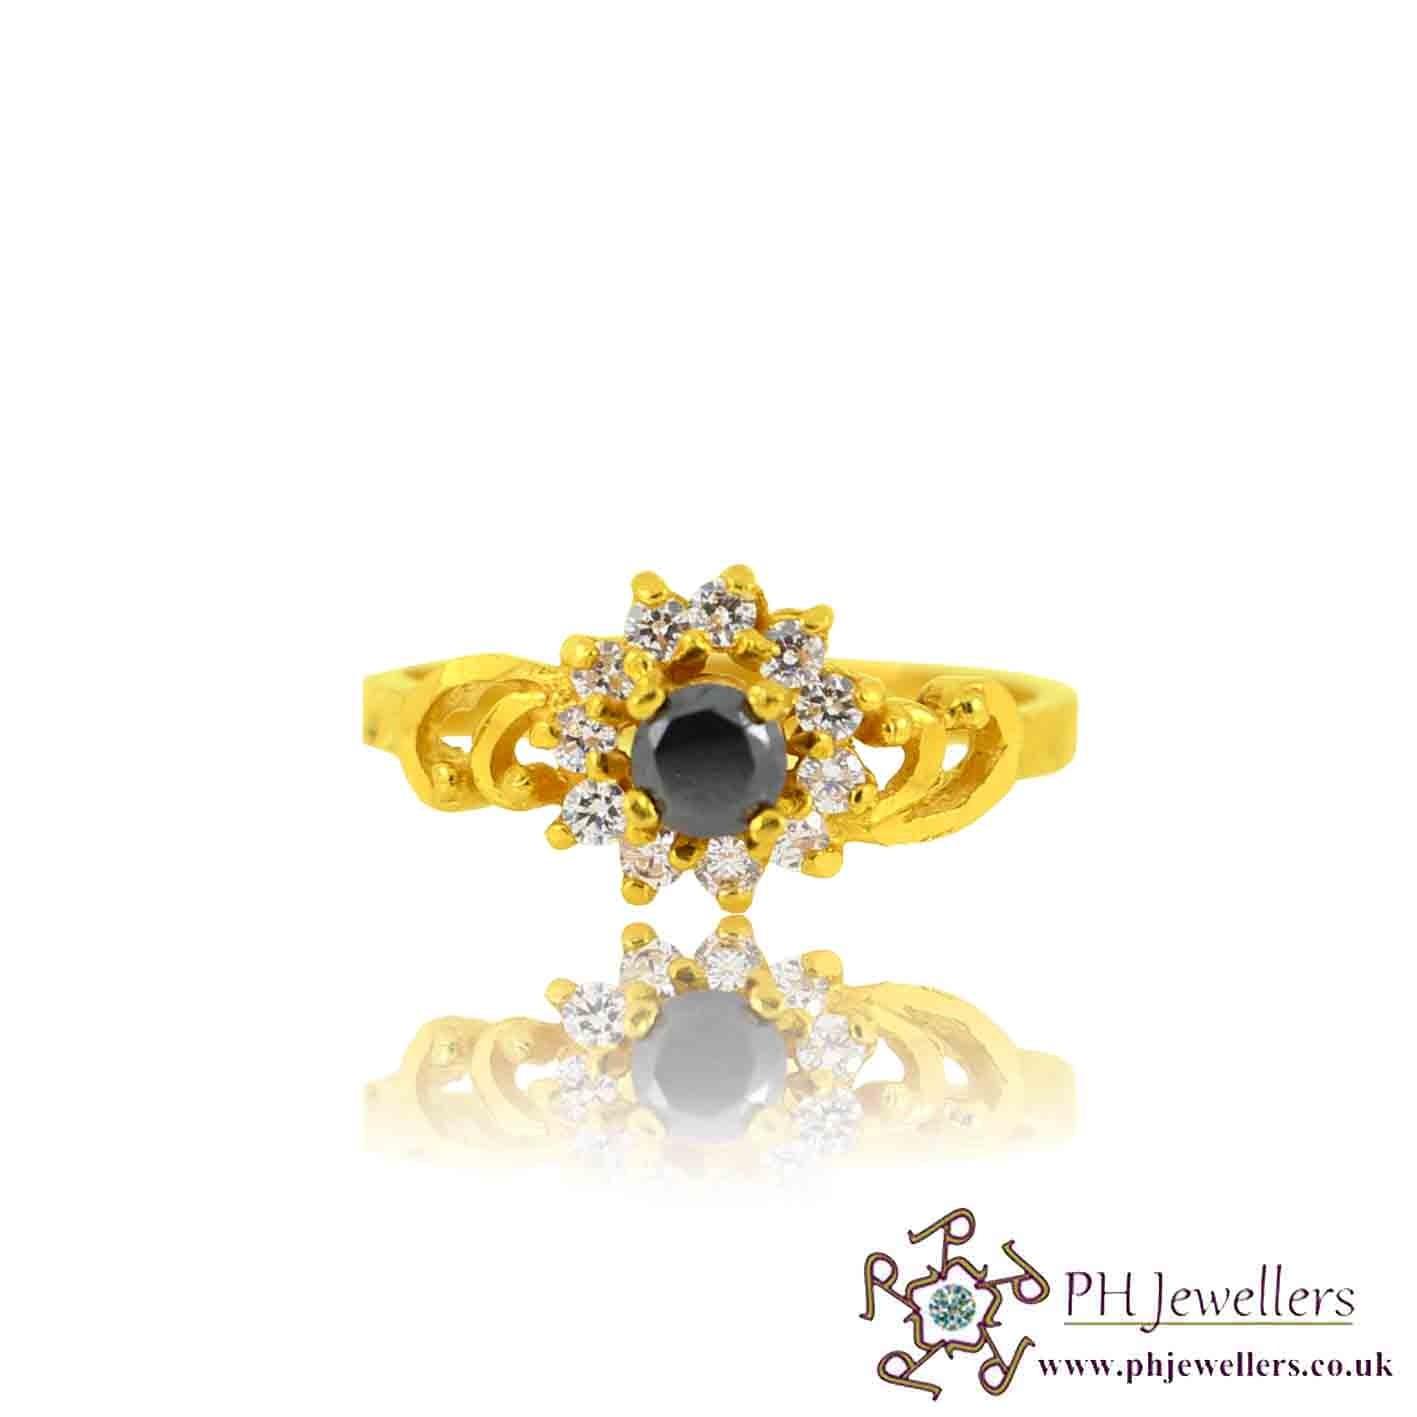 22ct 916 Yellow Gold Hallmark black Ring CZ Size L,M  SR122